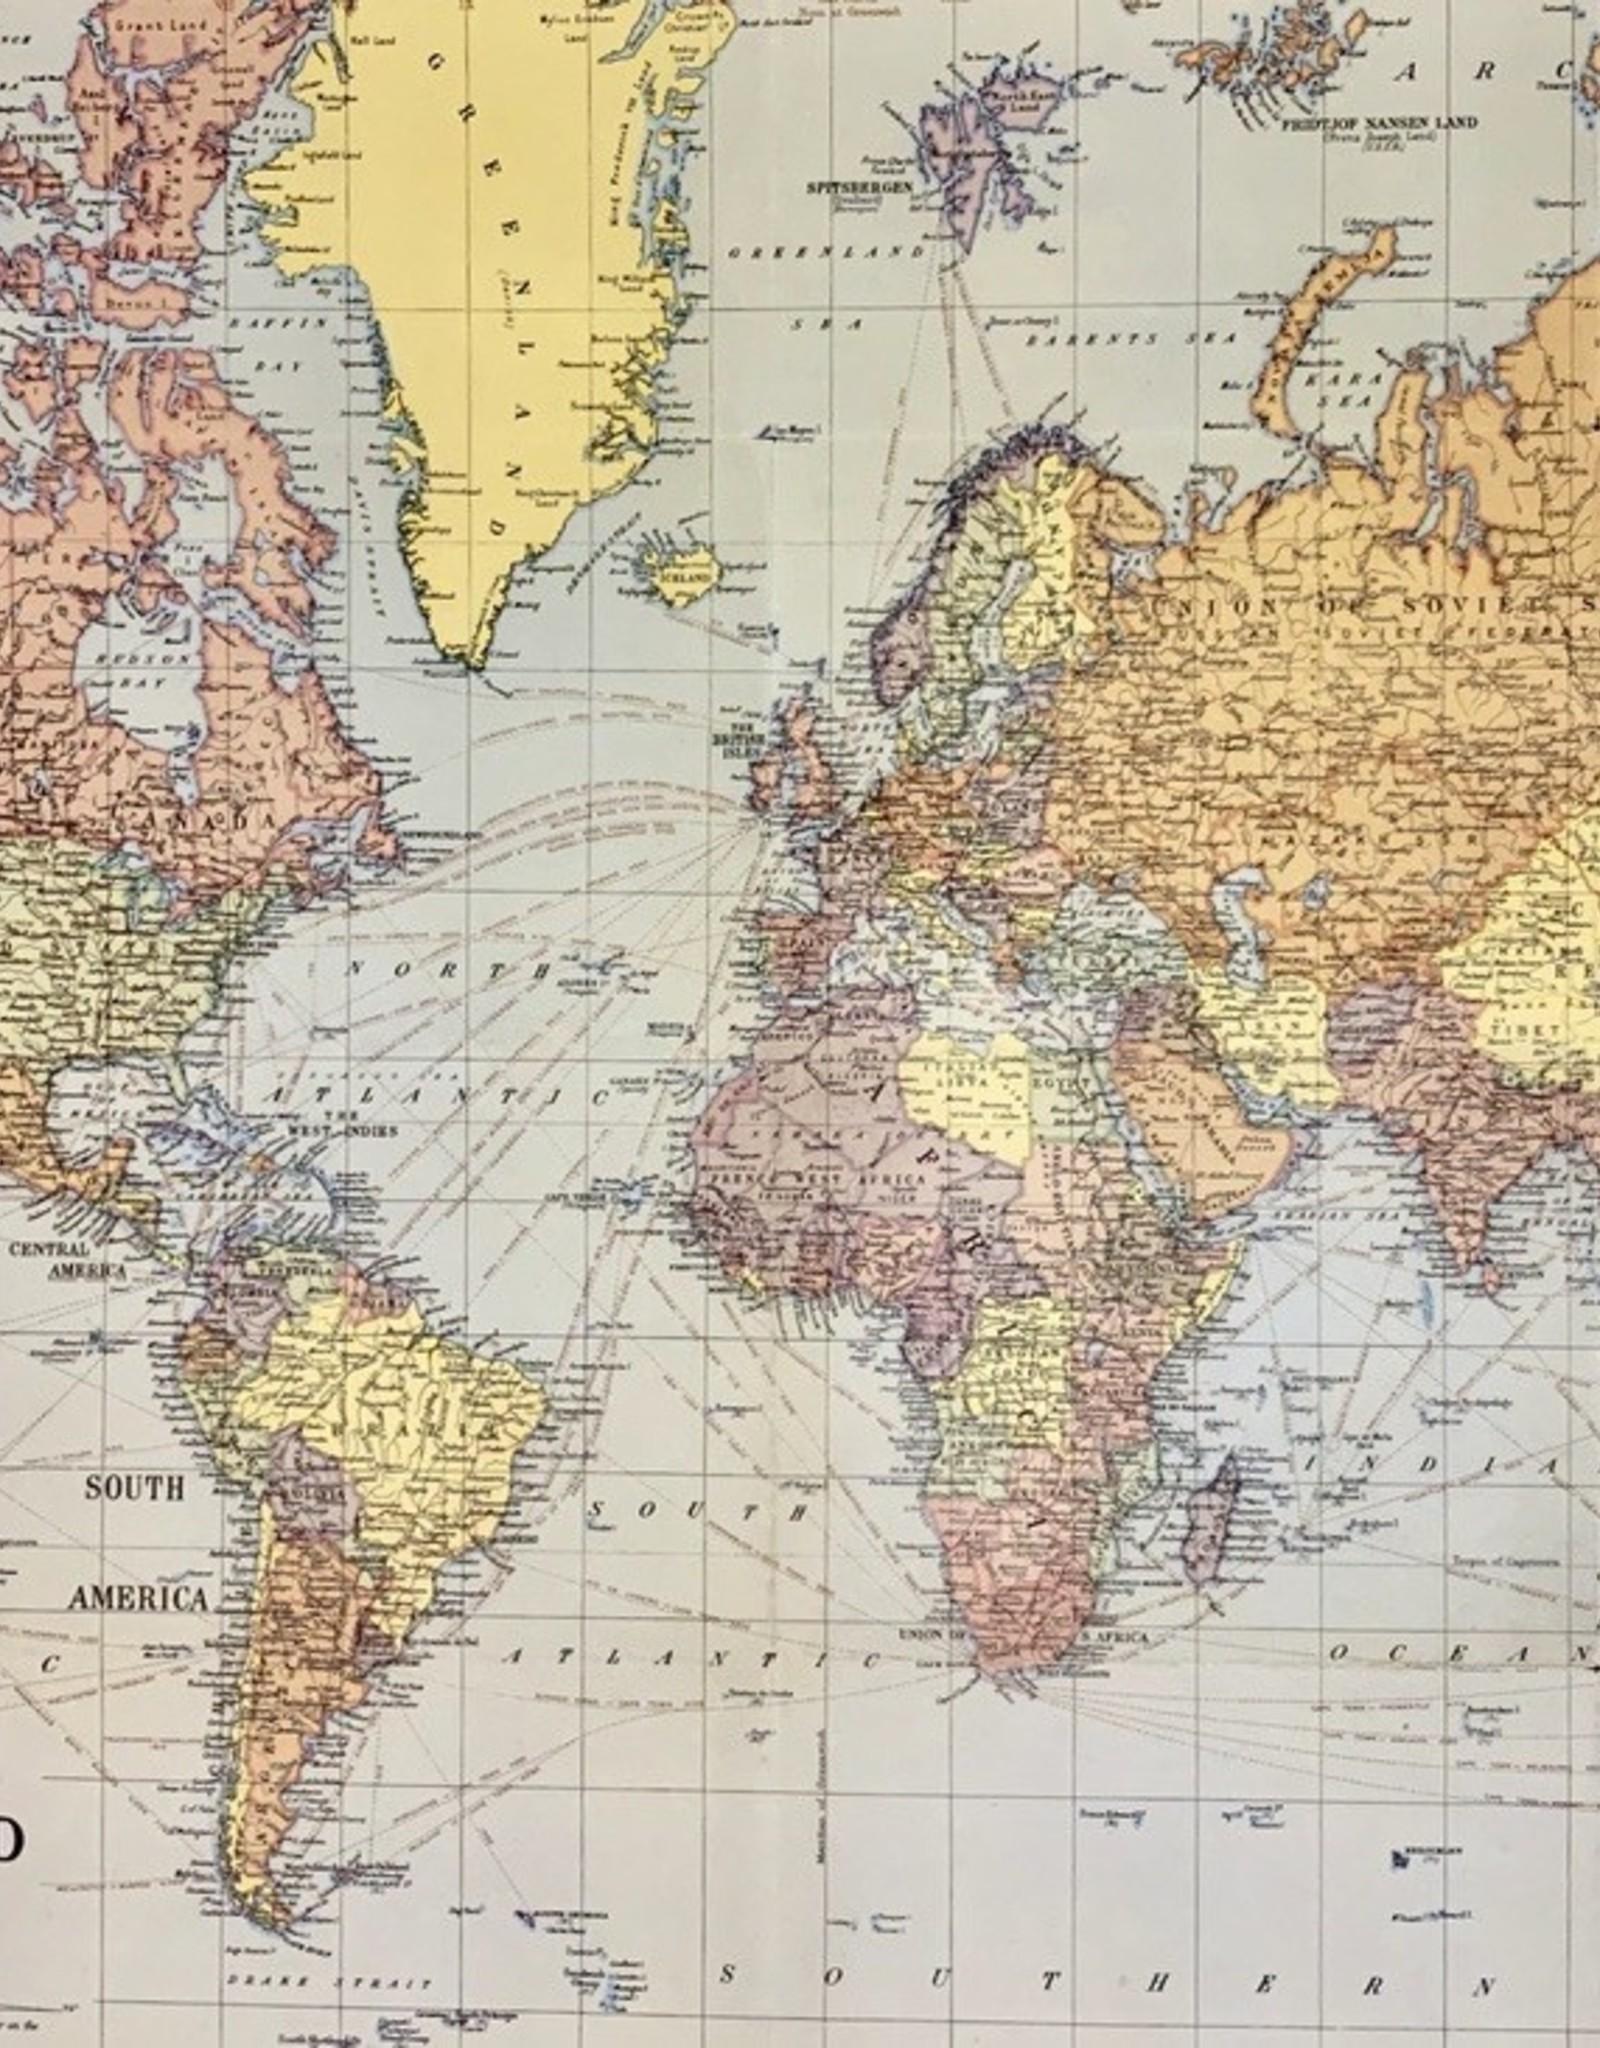 Portugal Map Decorative Paper Sheet 20x28 Cavallini /& Co